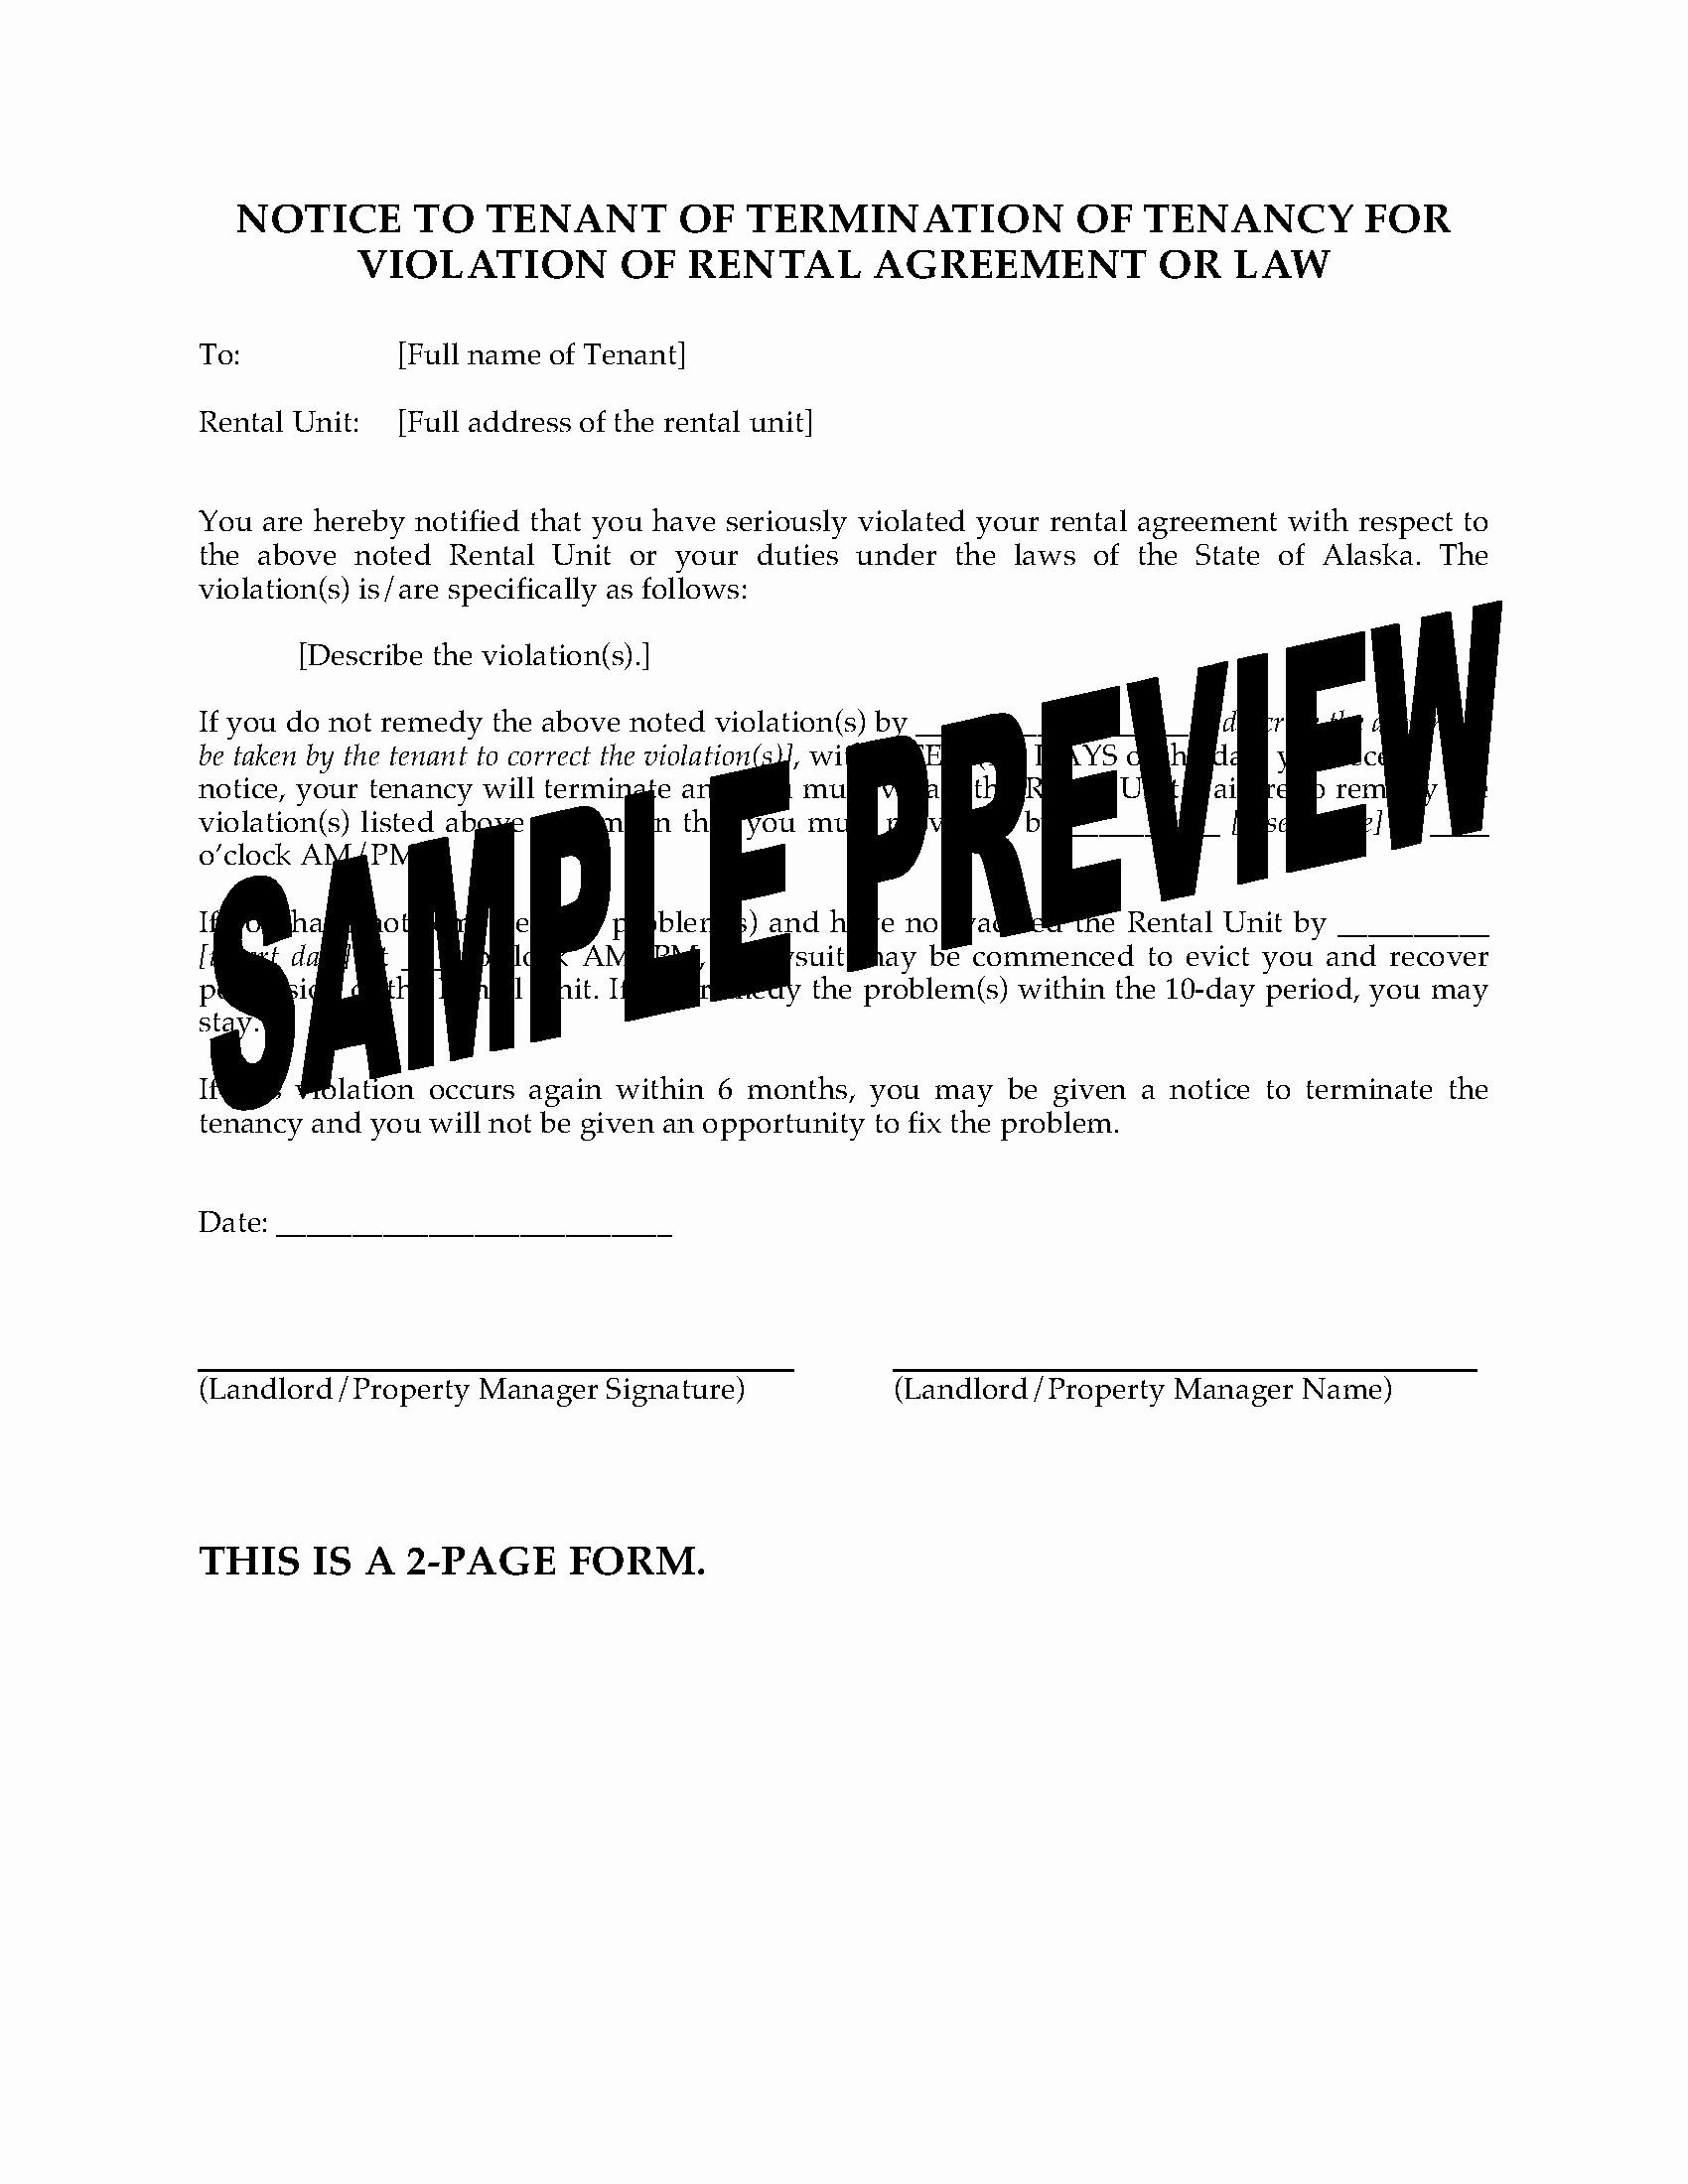 Notice Of Lease Violation Template Unique Alaska Notice Of Termination Of Tenancy for Violation Of